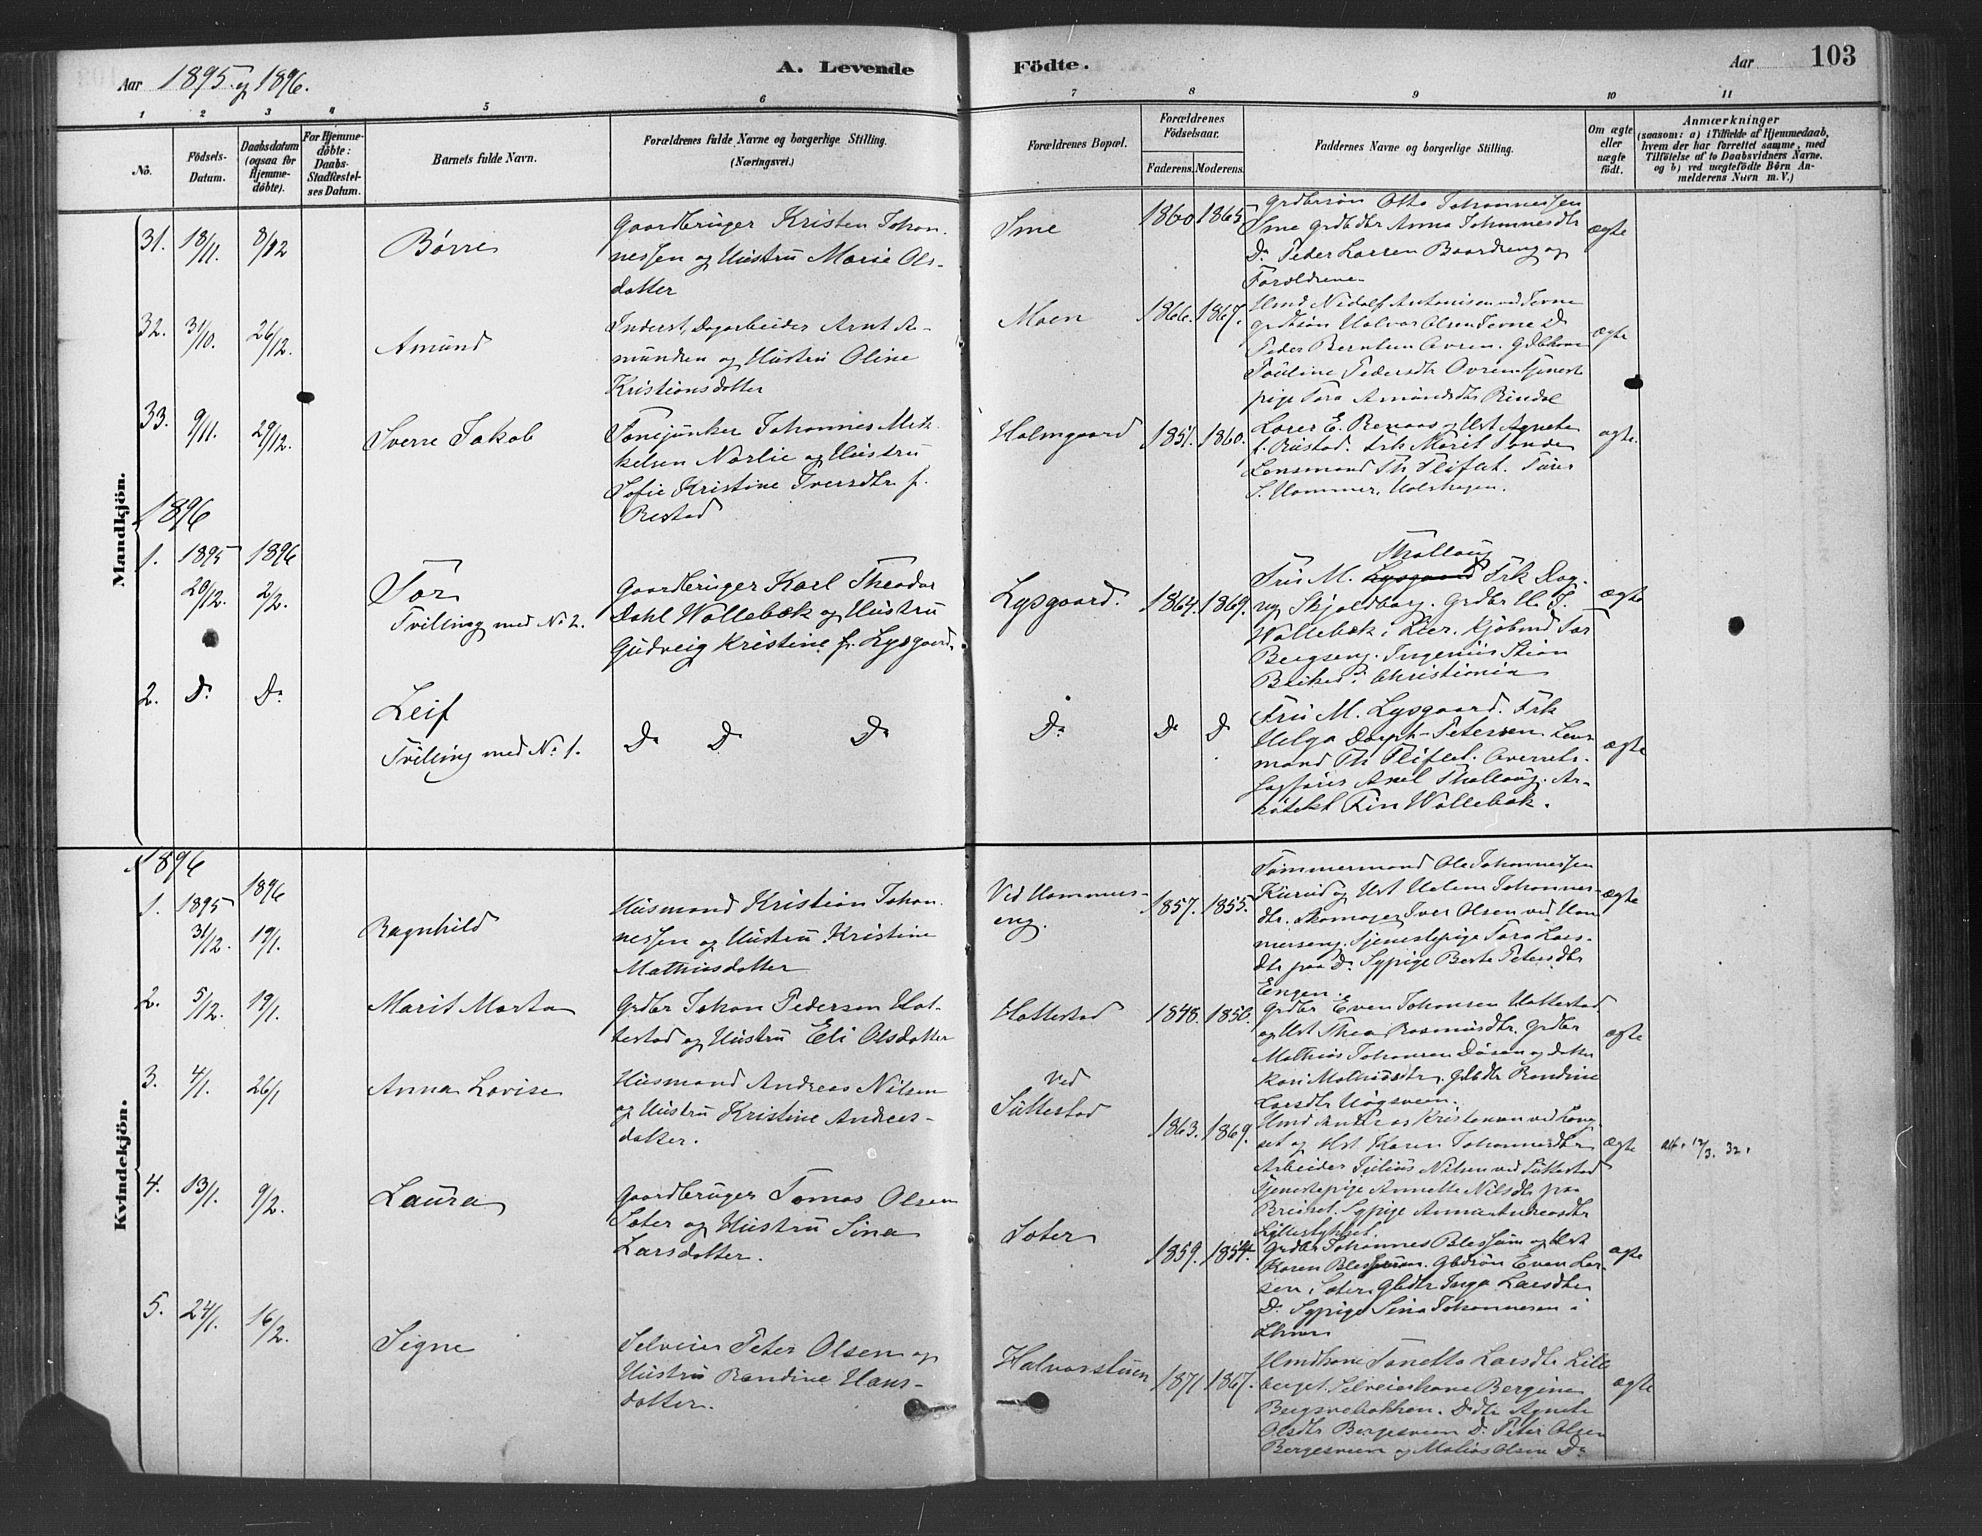 SAH, Fåberg prestekontor, Ministerialbok nr. 9, 1879-1898, s. 103